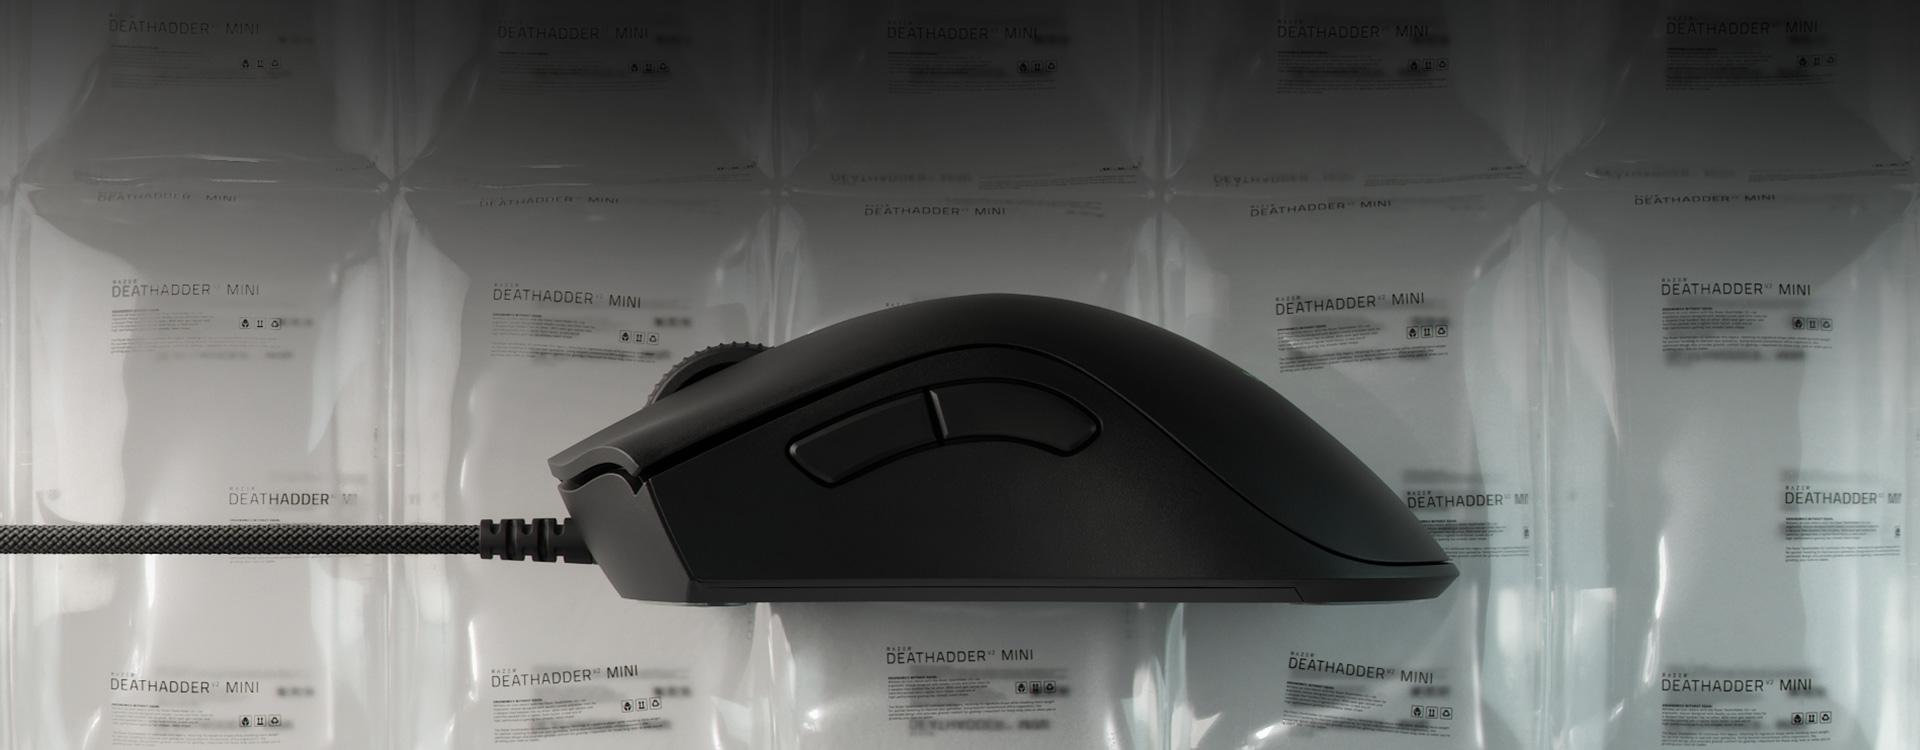 https://assets2.razerzone.com/images/pnx.assets/7d12512f21bfb23d8e5f7c2a58114c75/razer-deathadder-v2-mini-2020-usp1-desktop.jpg